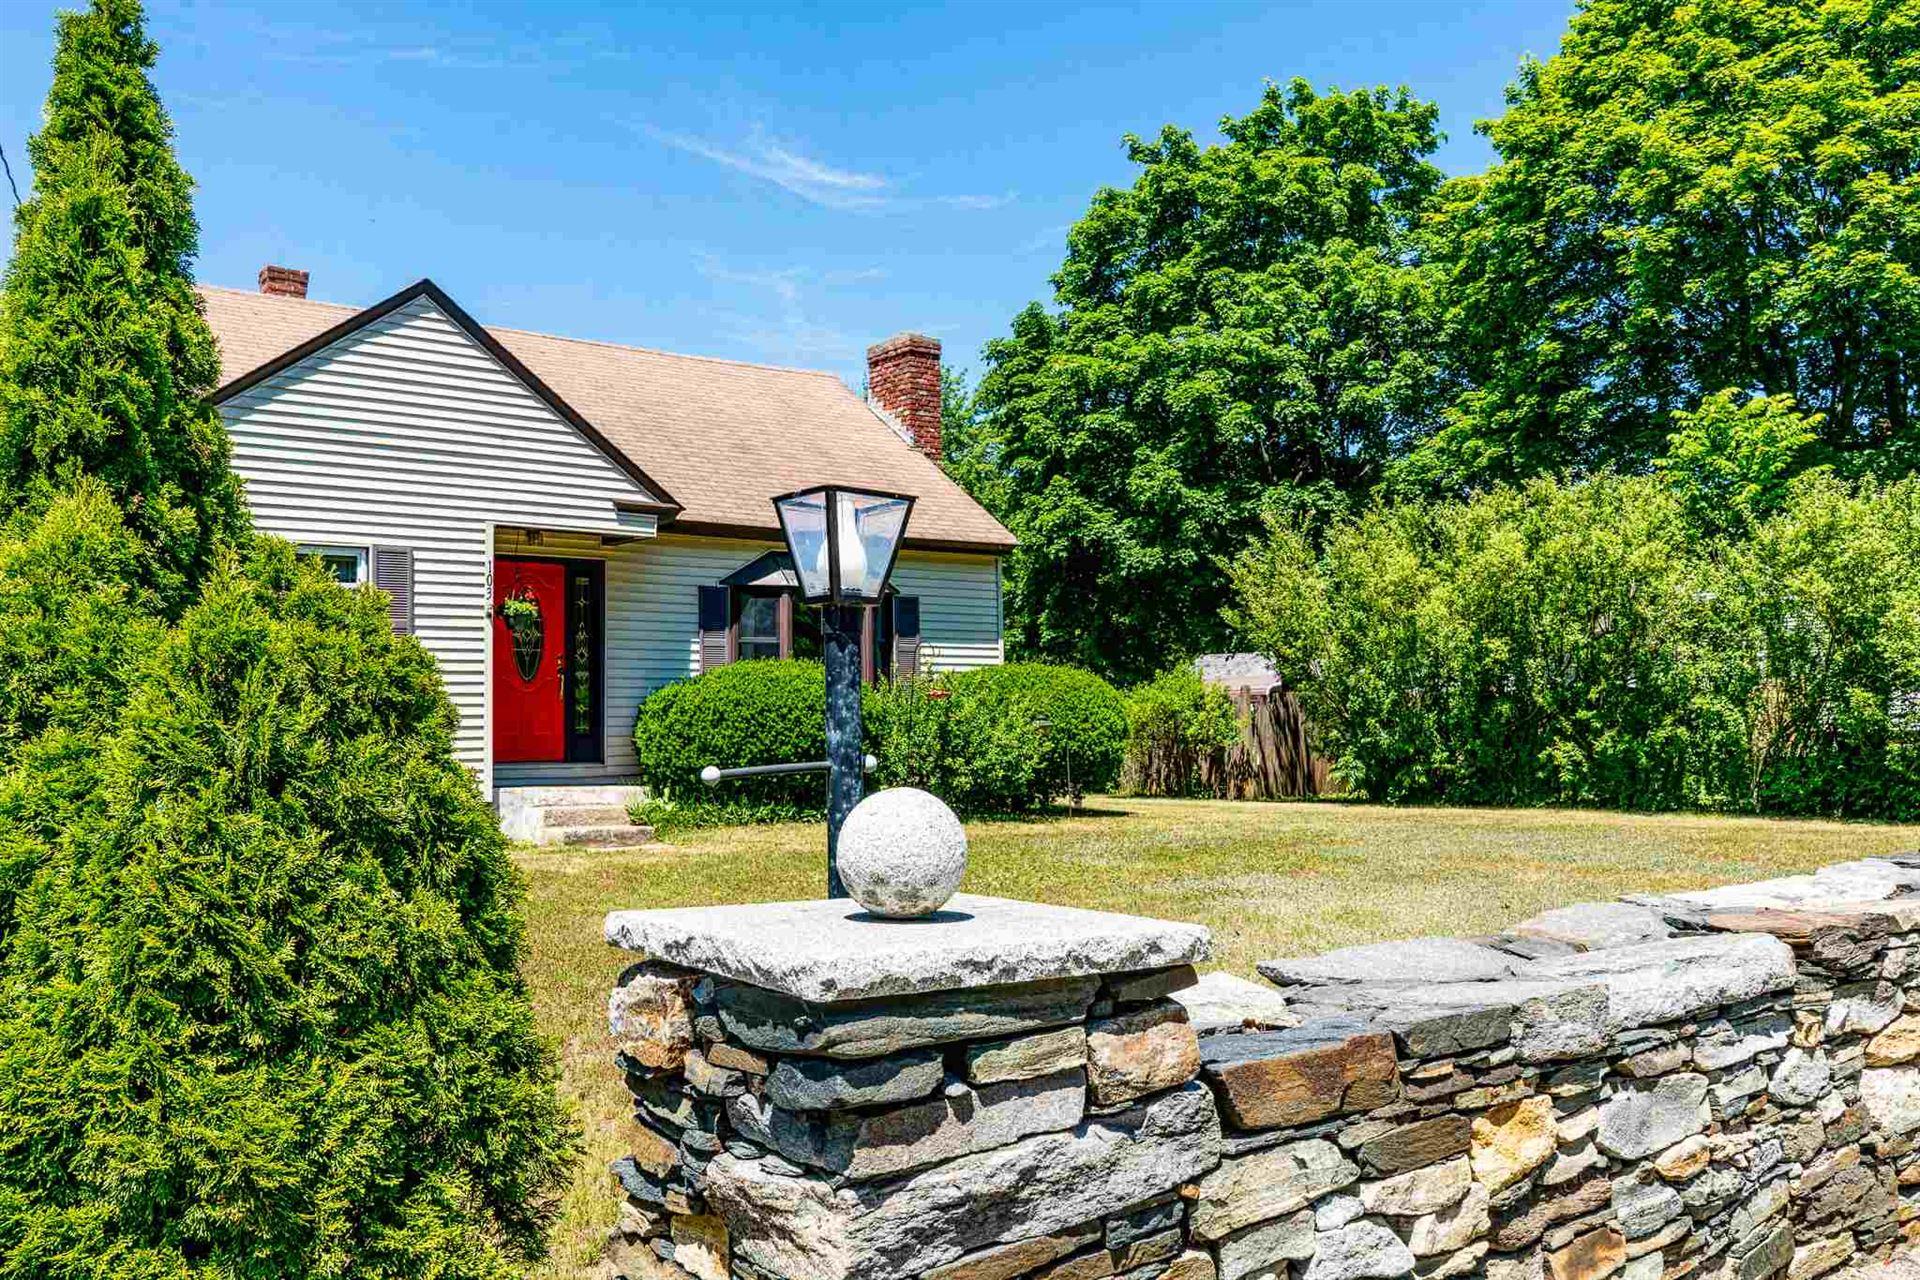 103 Old Homestead Highway, Swanzey, NH 03431 - MLS#: 4812522